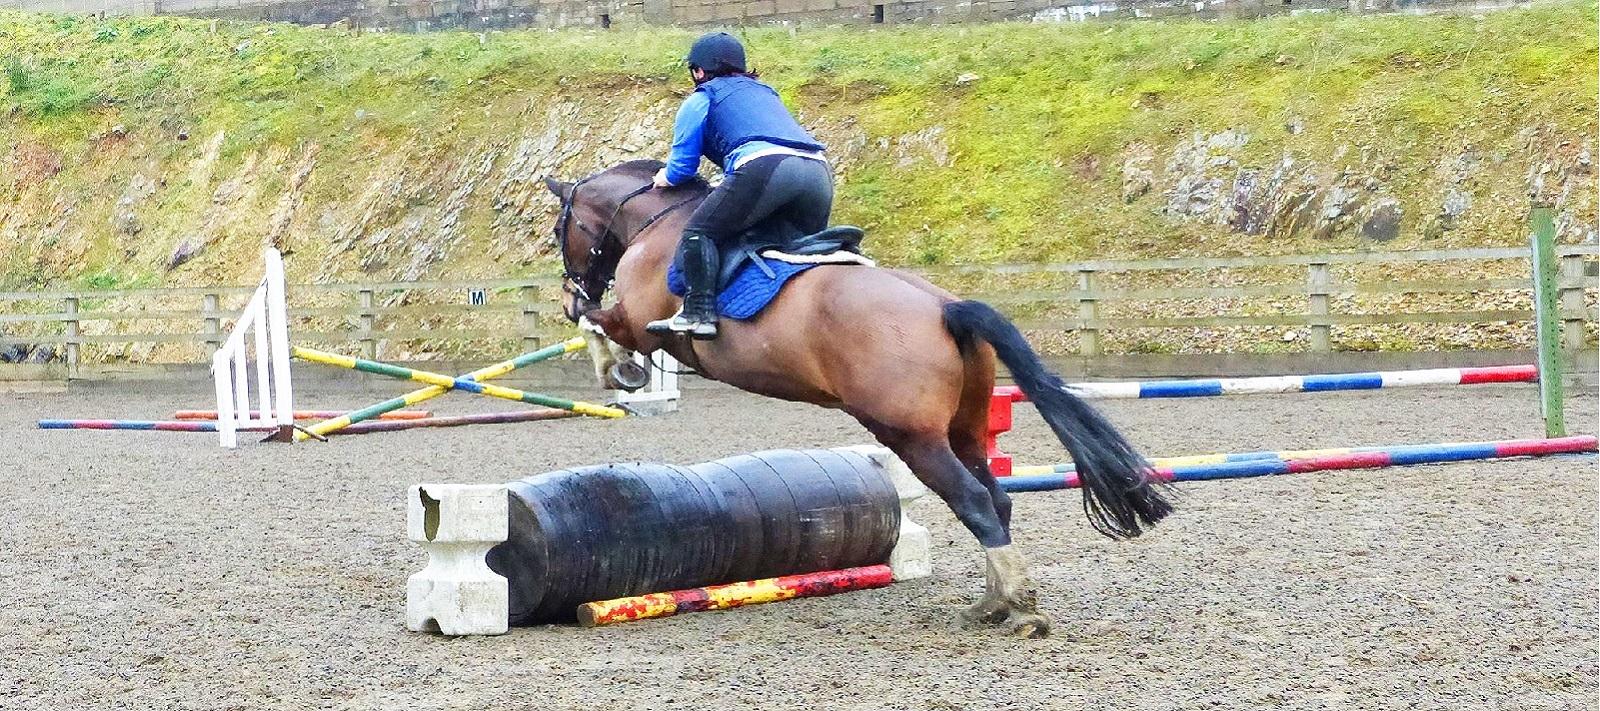 Jumping Lesson Bel-Air Equestrian Centre Ireland